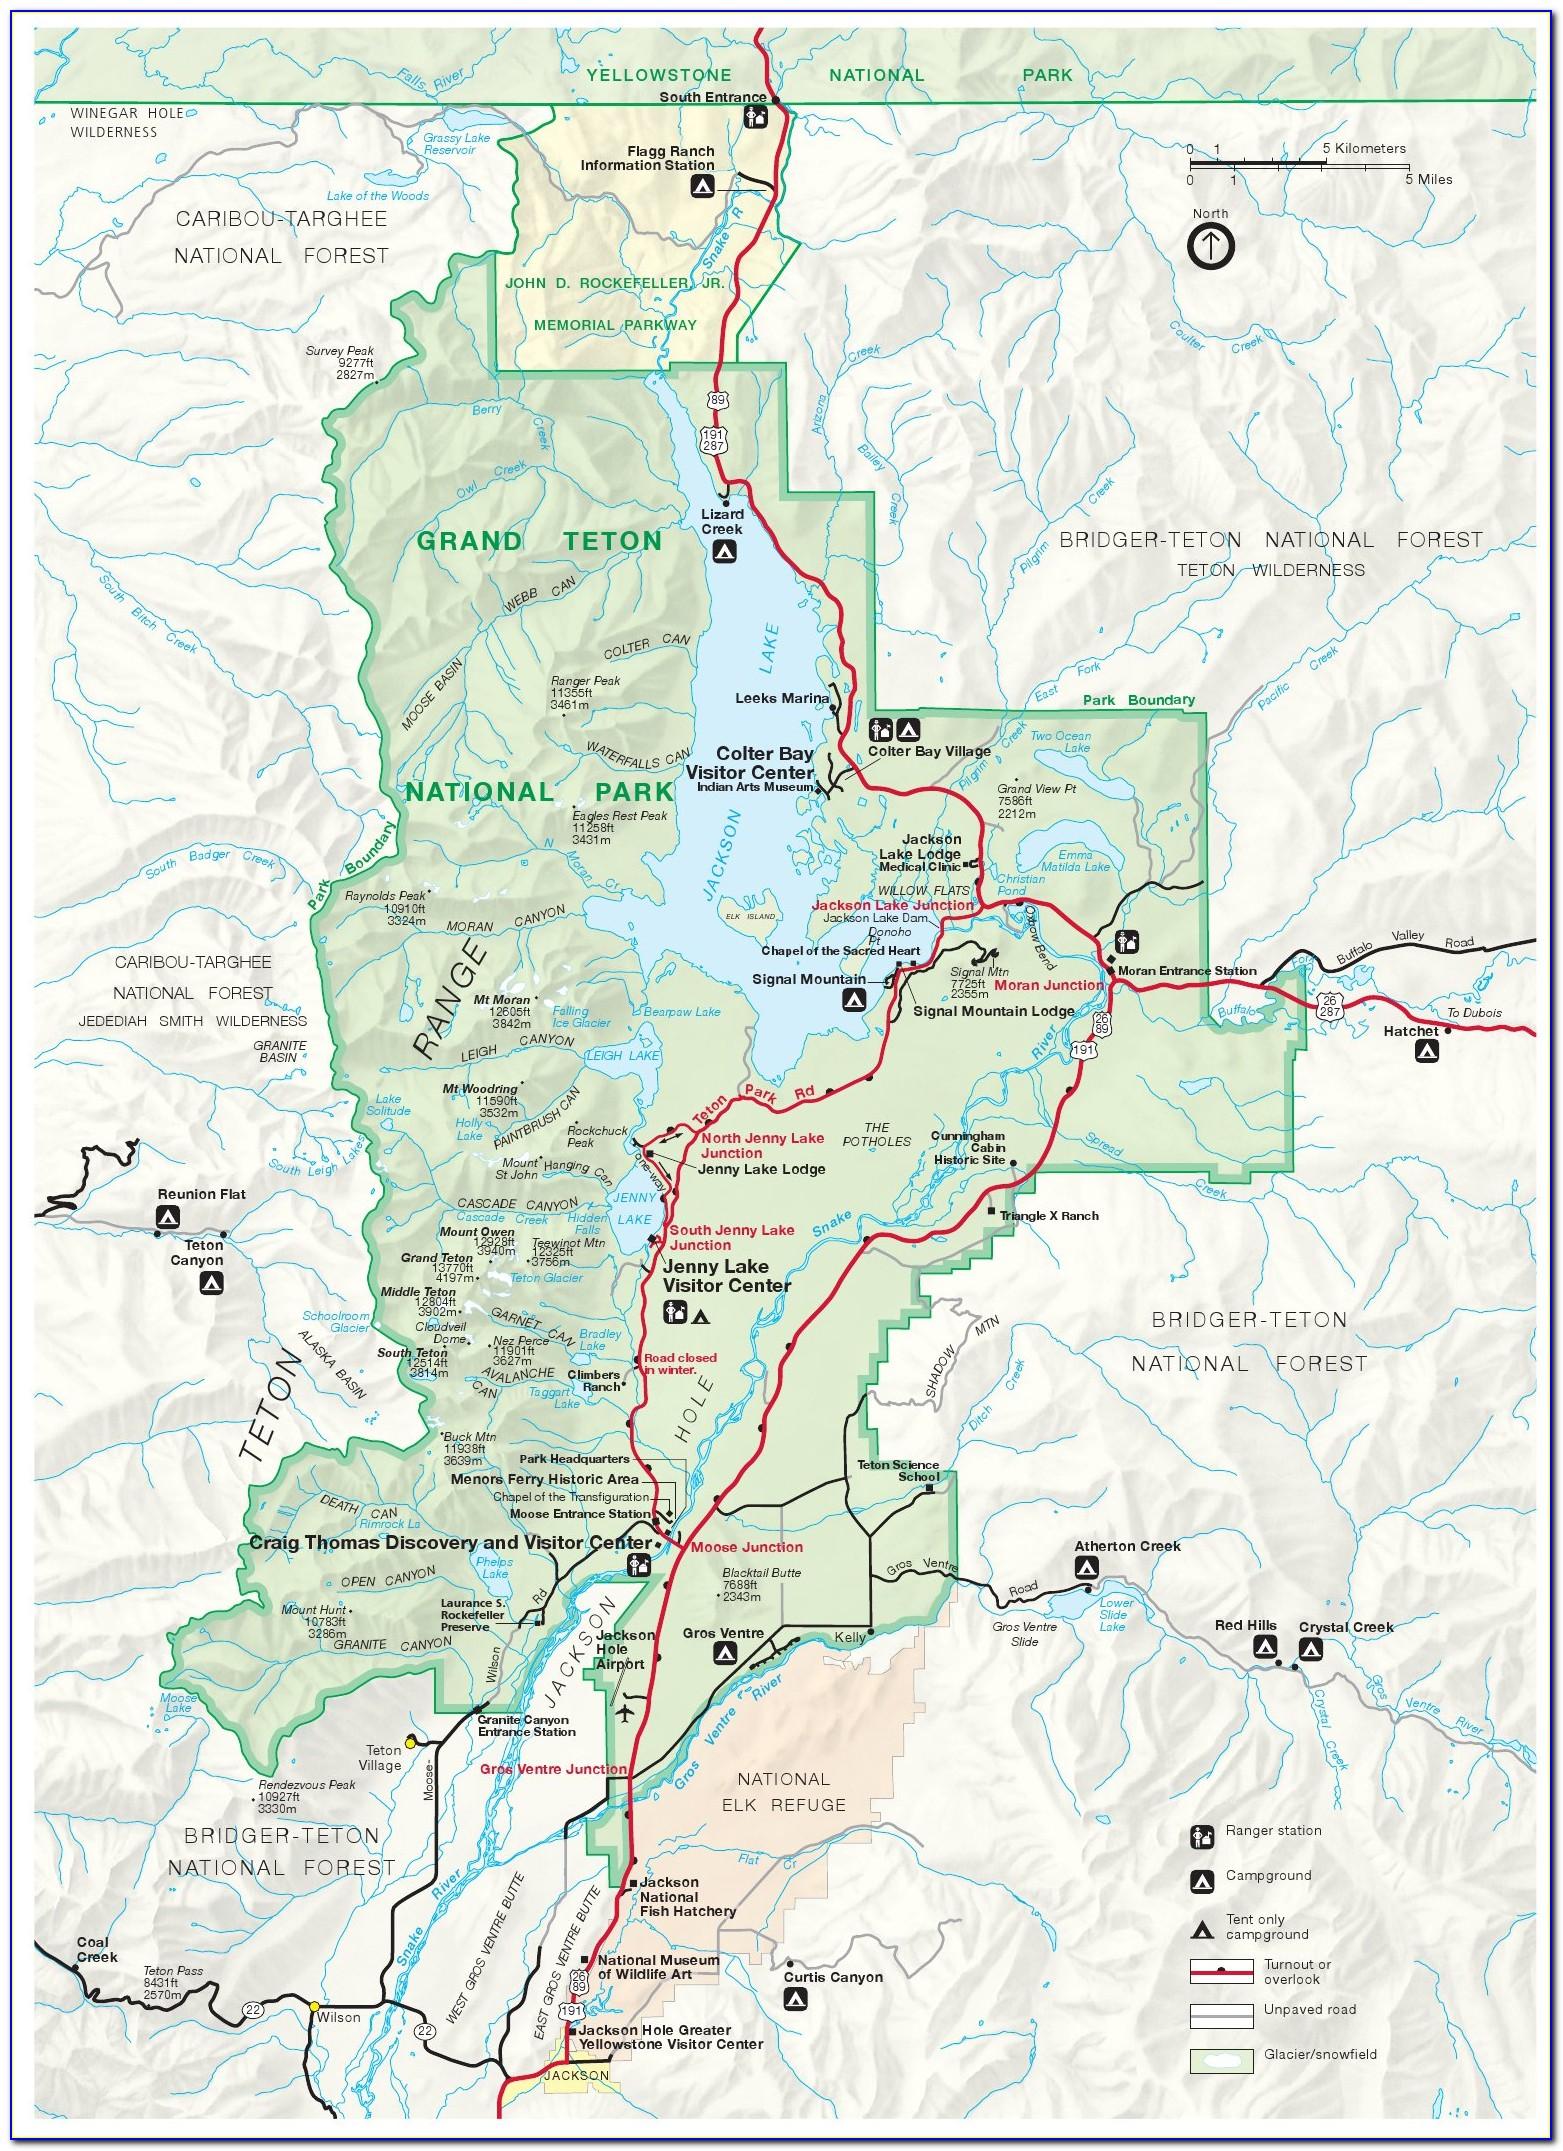 Grand Teton National Park Road Map